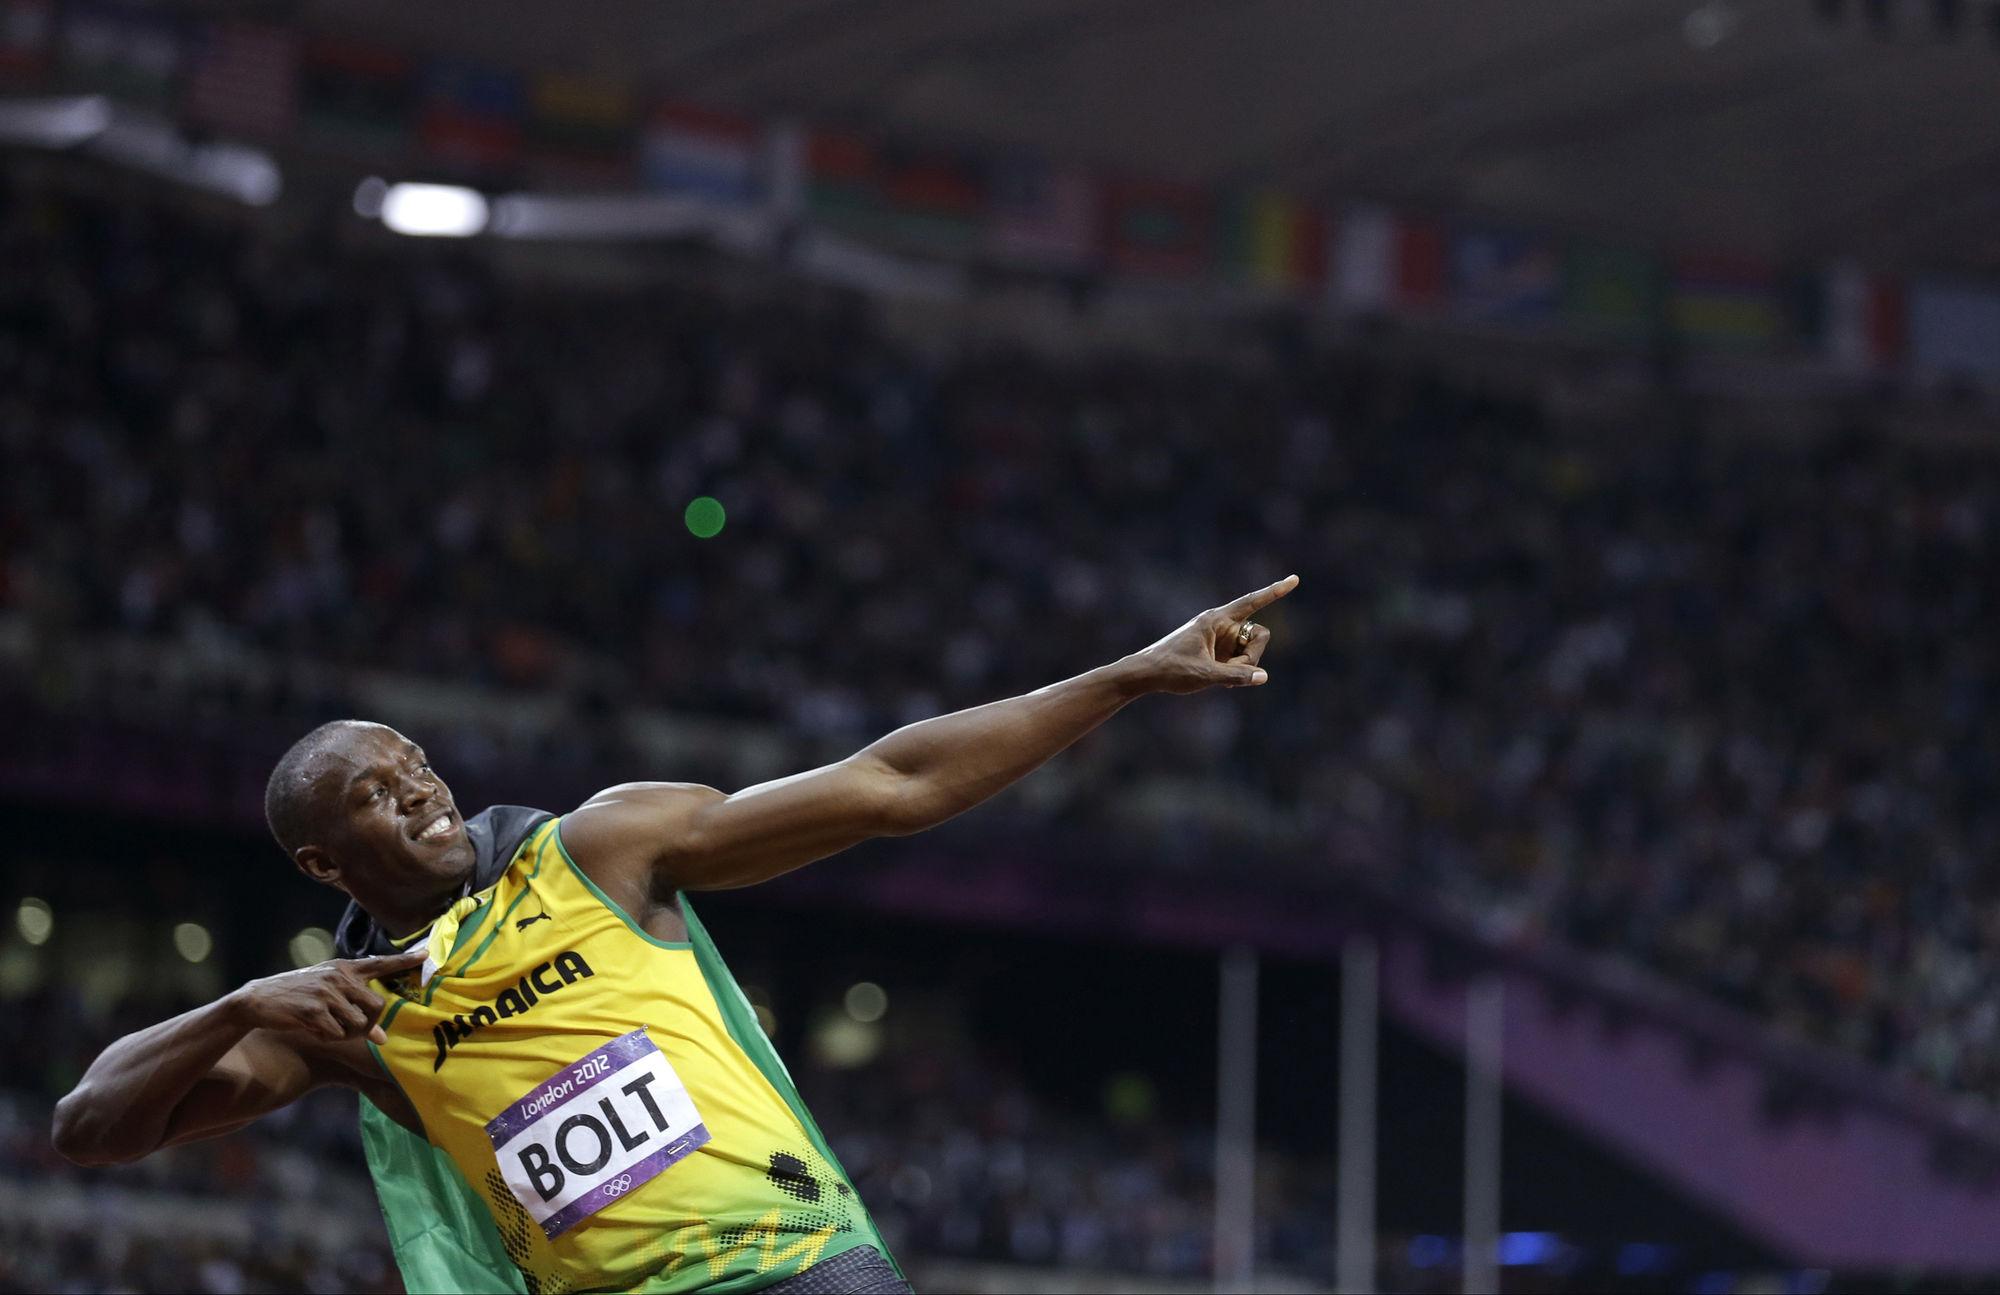 GOSEE ART: Usain Bolt, Olympische Sommerspiele, London,  5. August 2012 © Anja Niedringhaus/AP